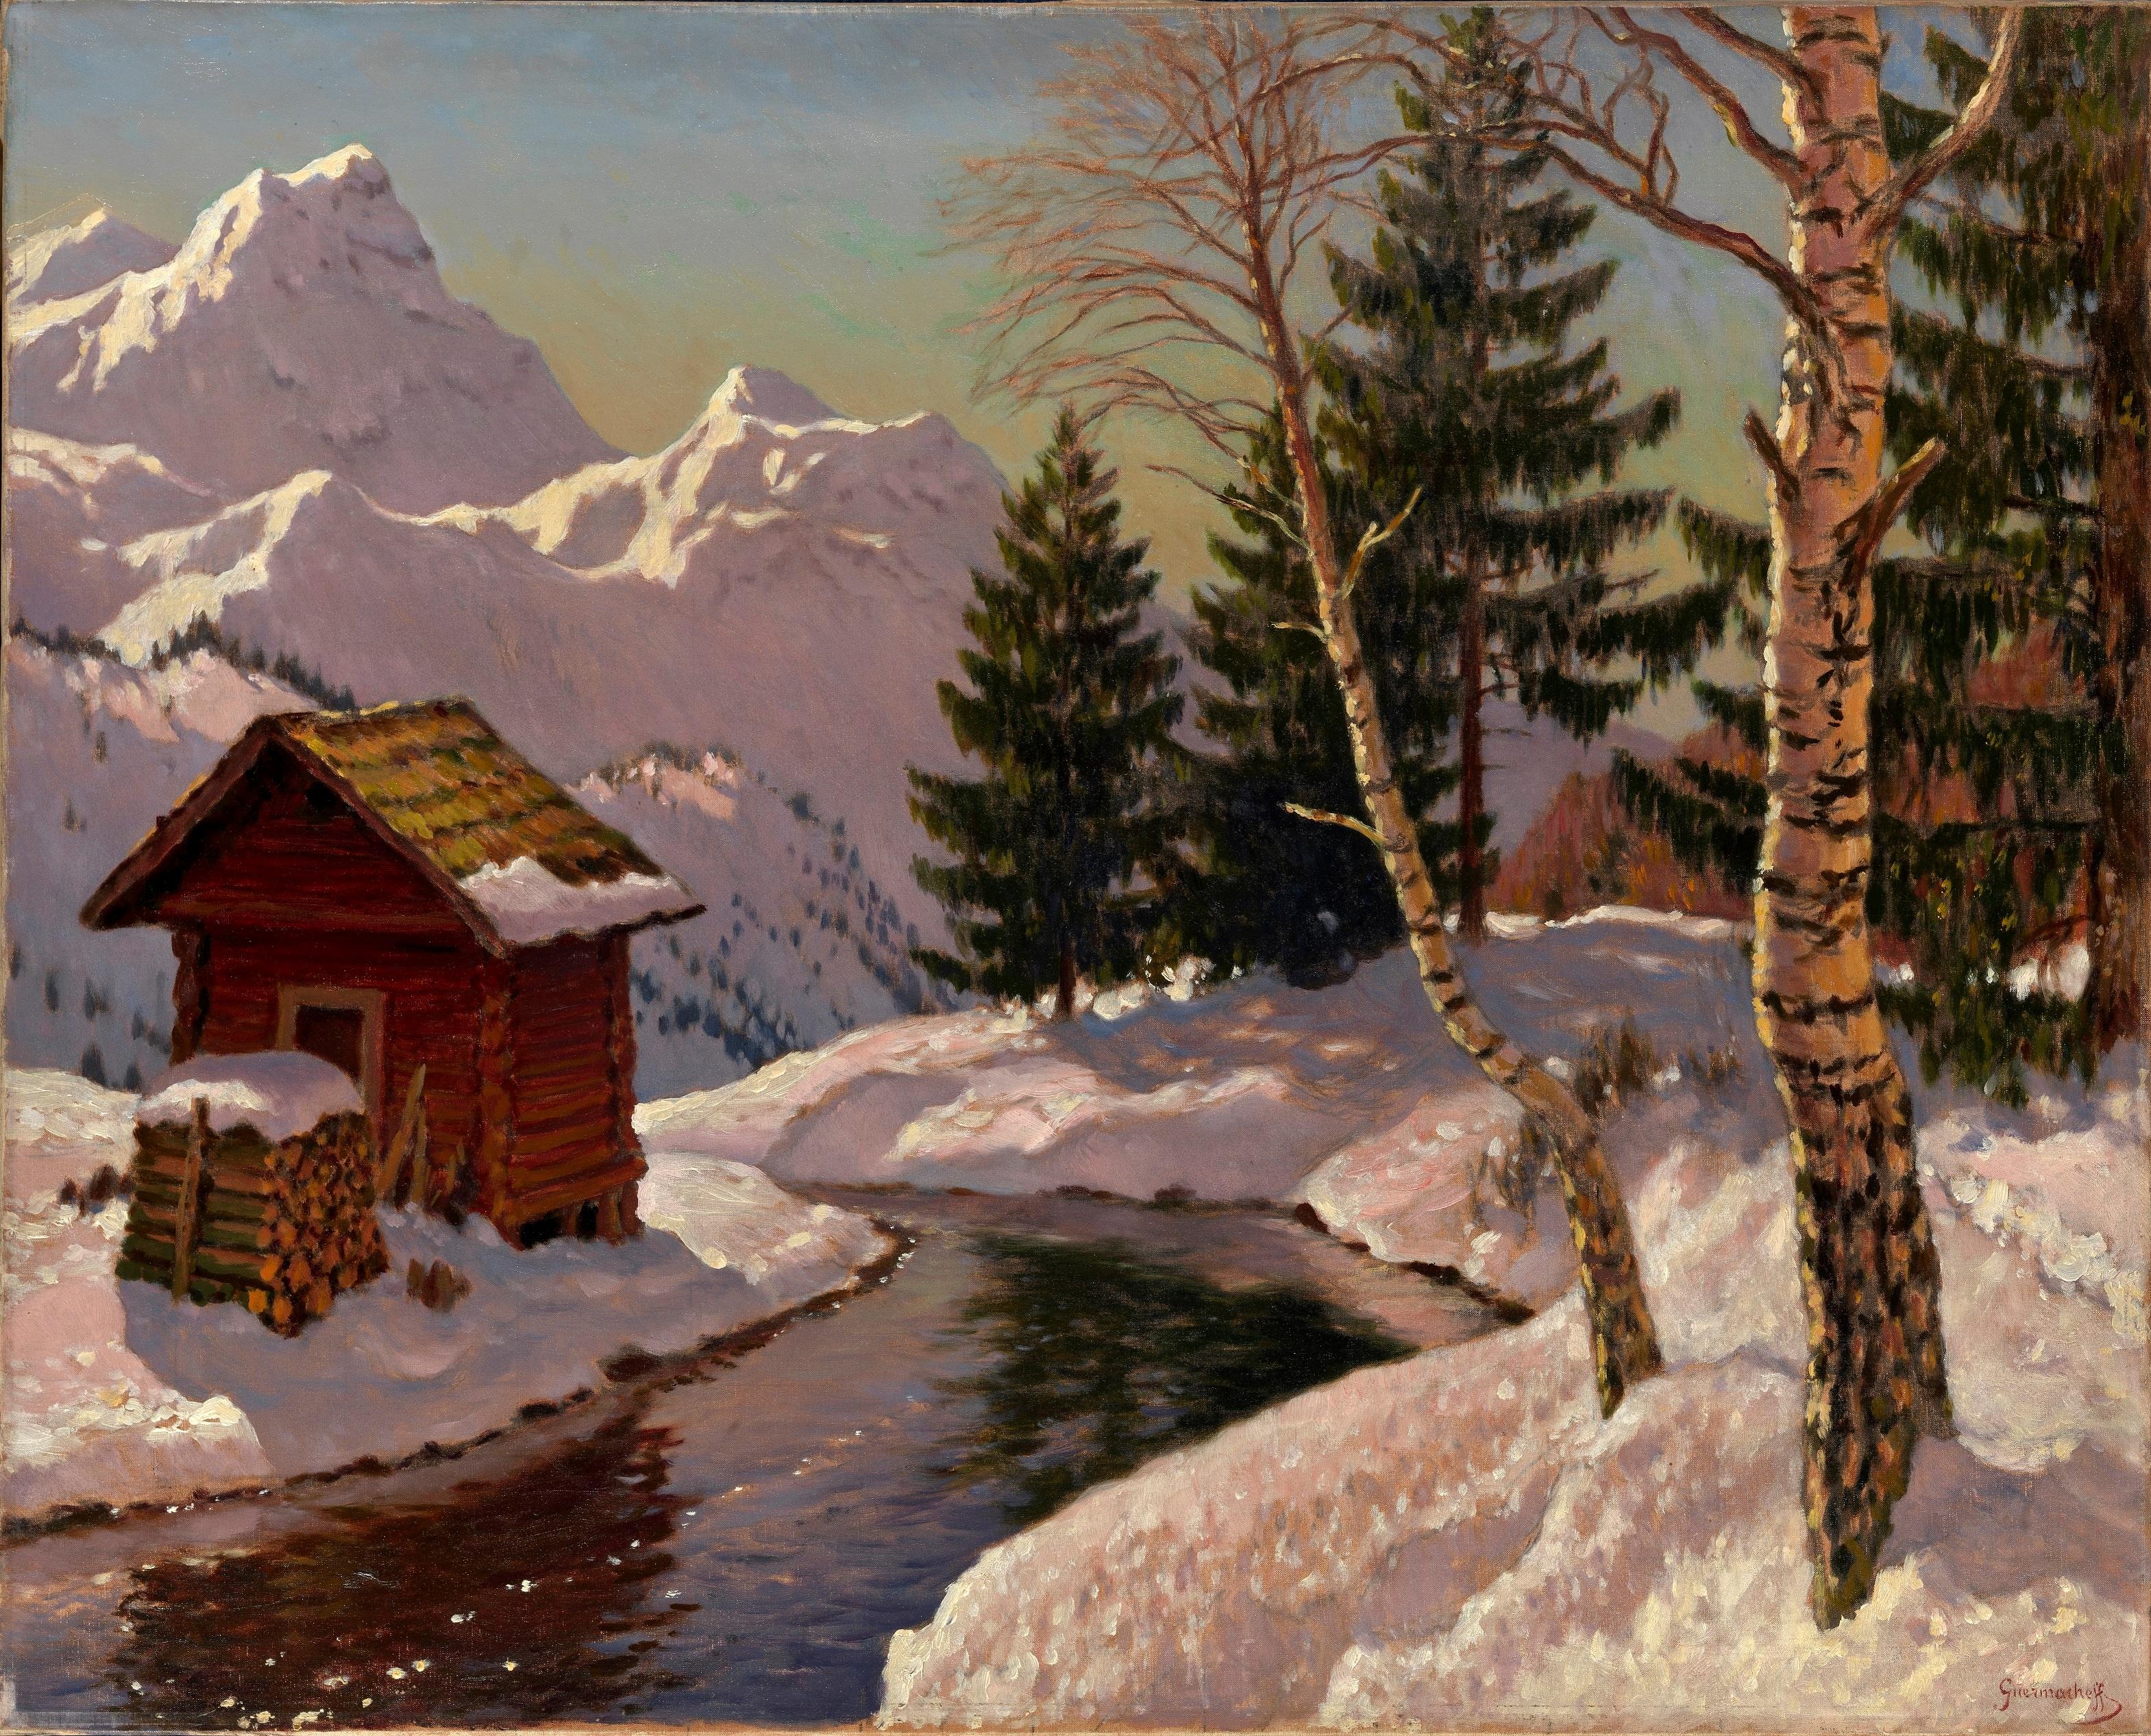 GERMASHEV, MIKHAIL Winter Landscape